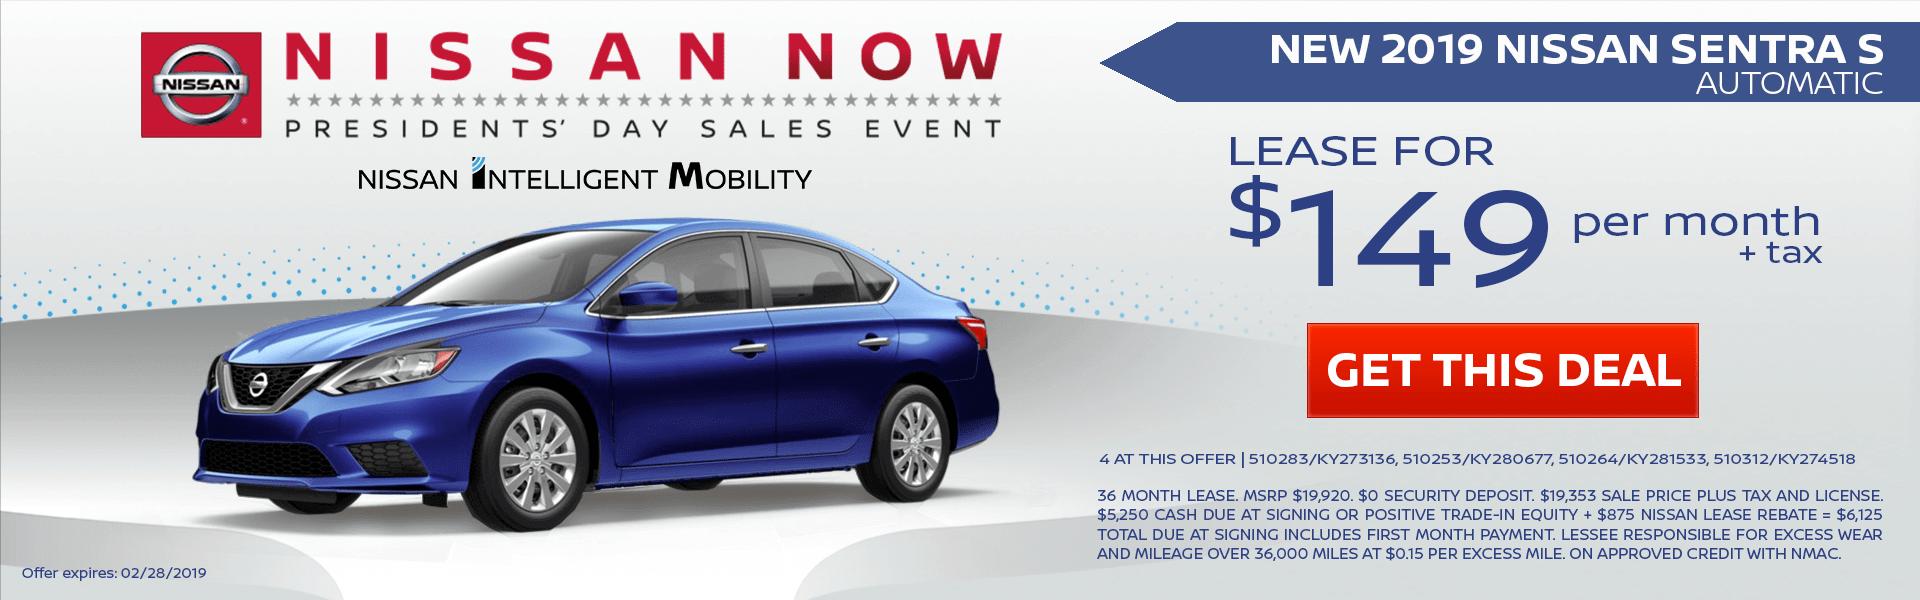 Nissan Dealership Los Angeles >> New & Used Car Dealership Los Angeles Cty | Ross Nissan of ...